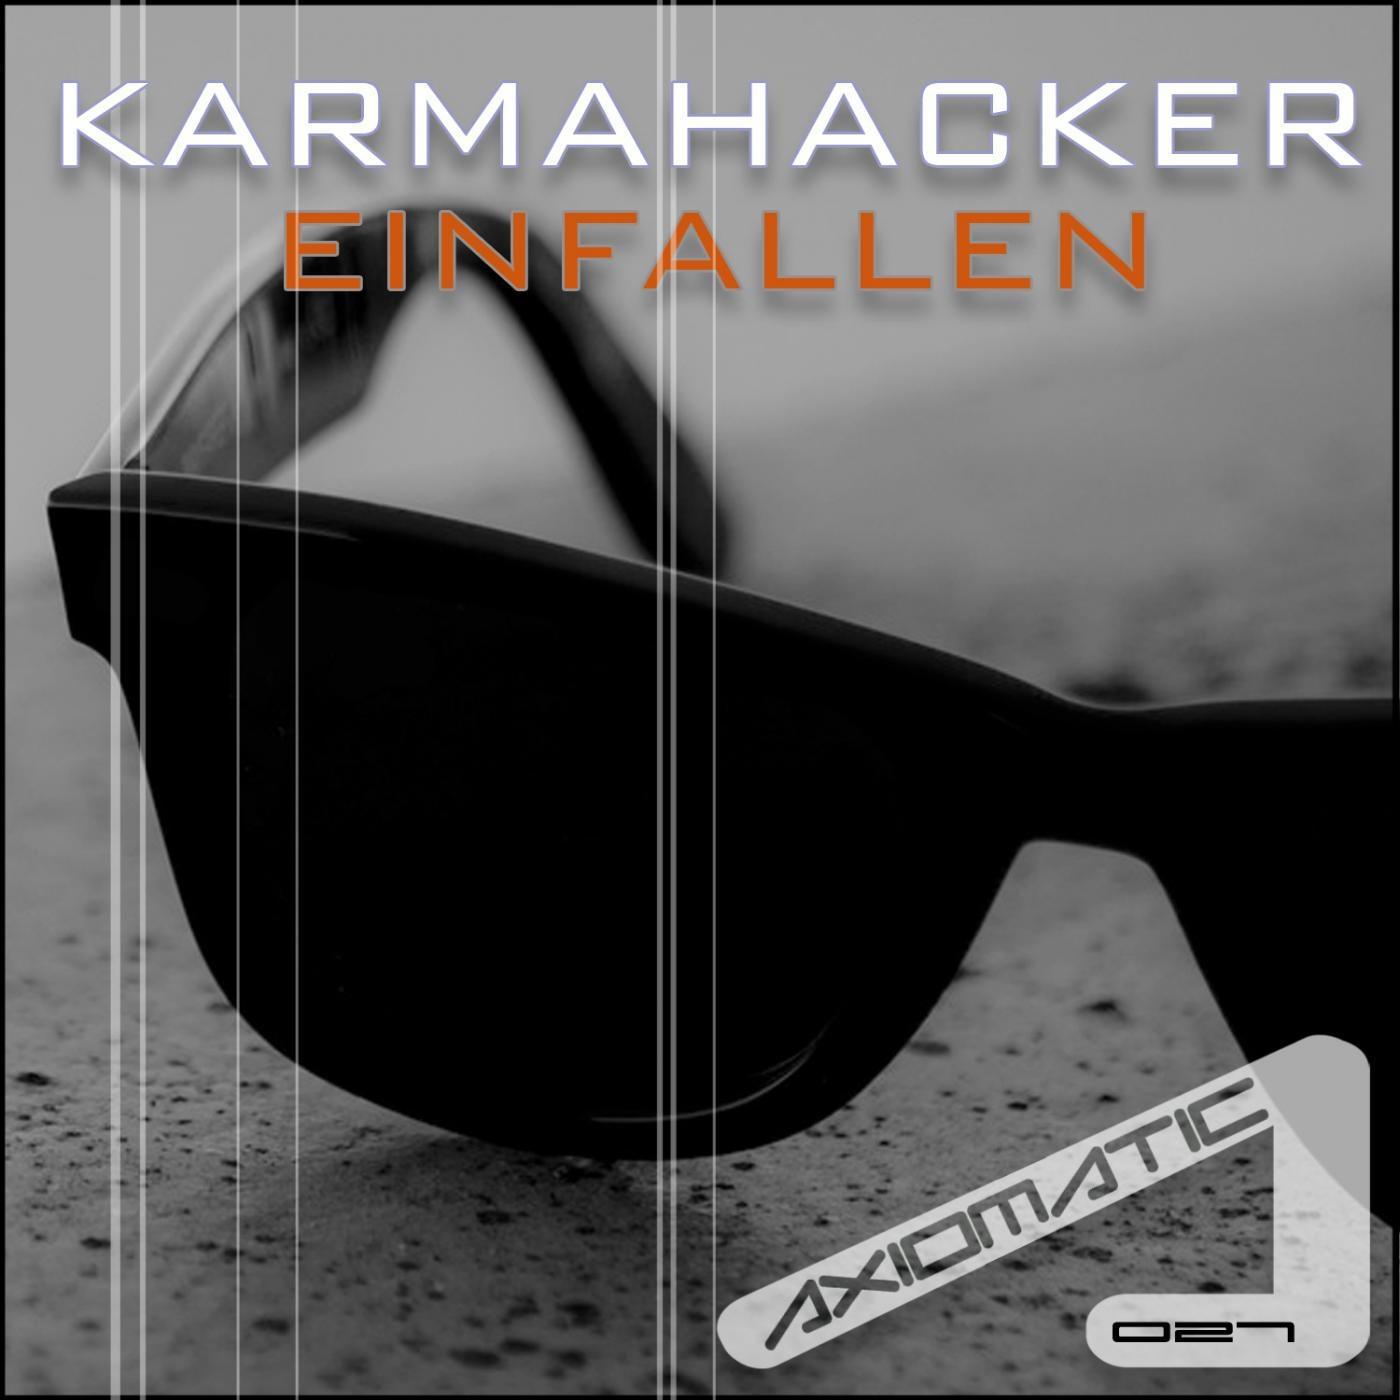 Karmahacker - Petite (Original mix)